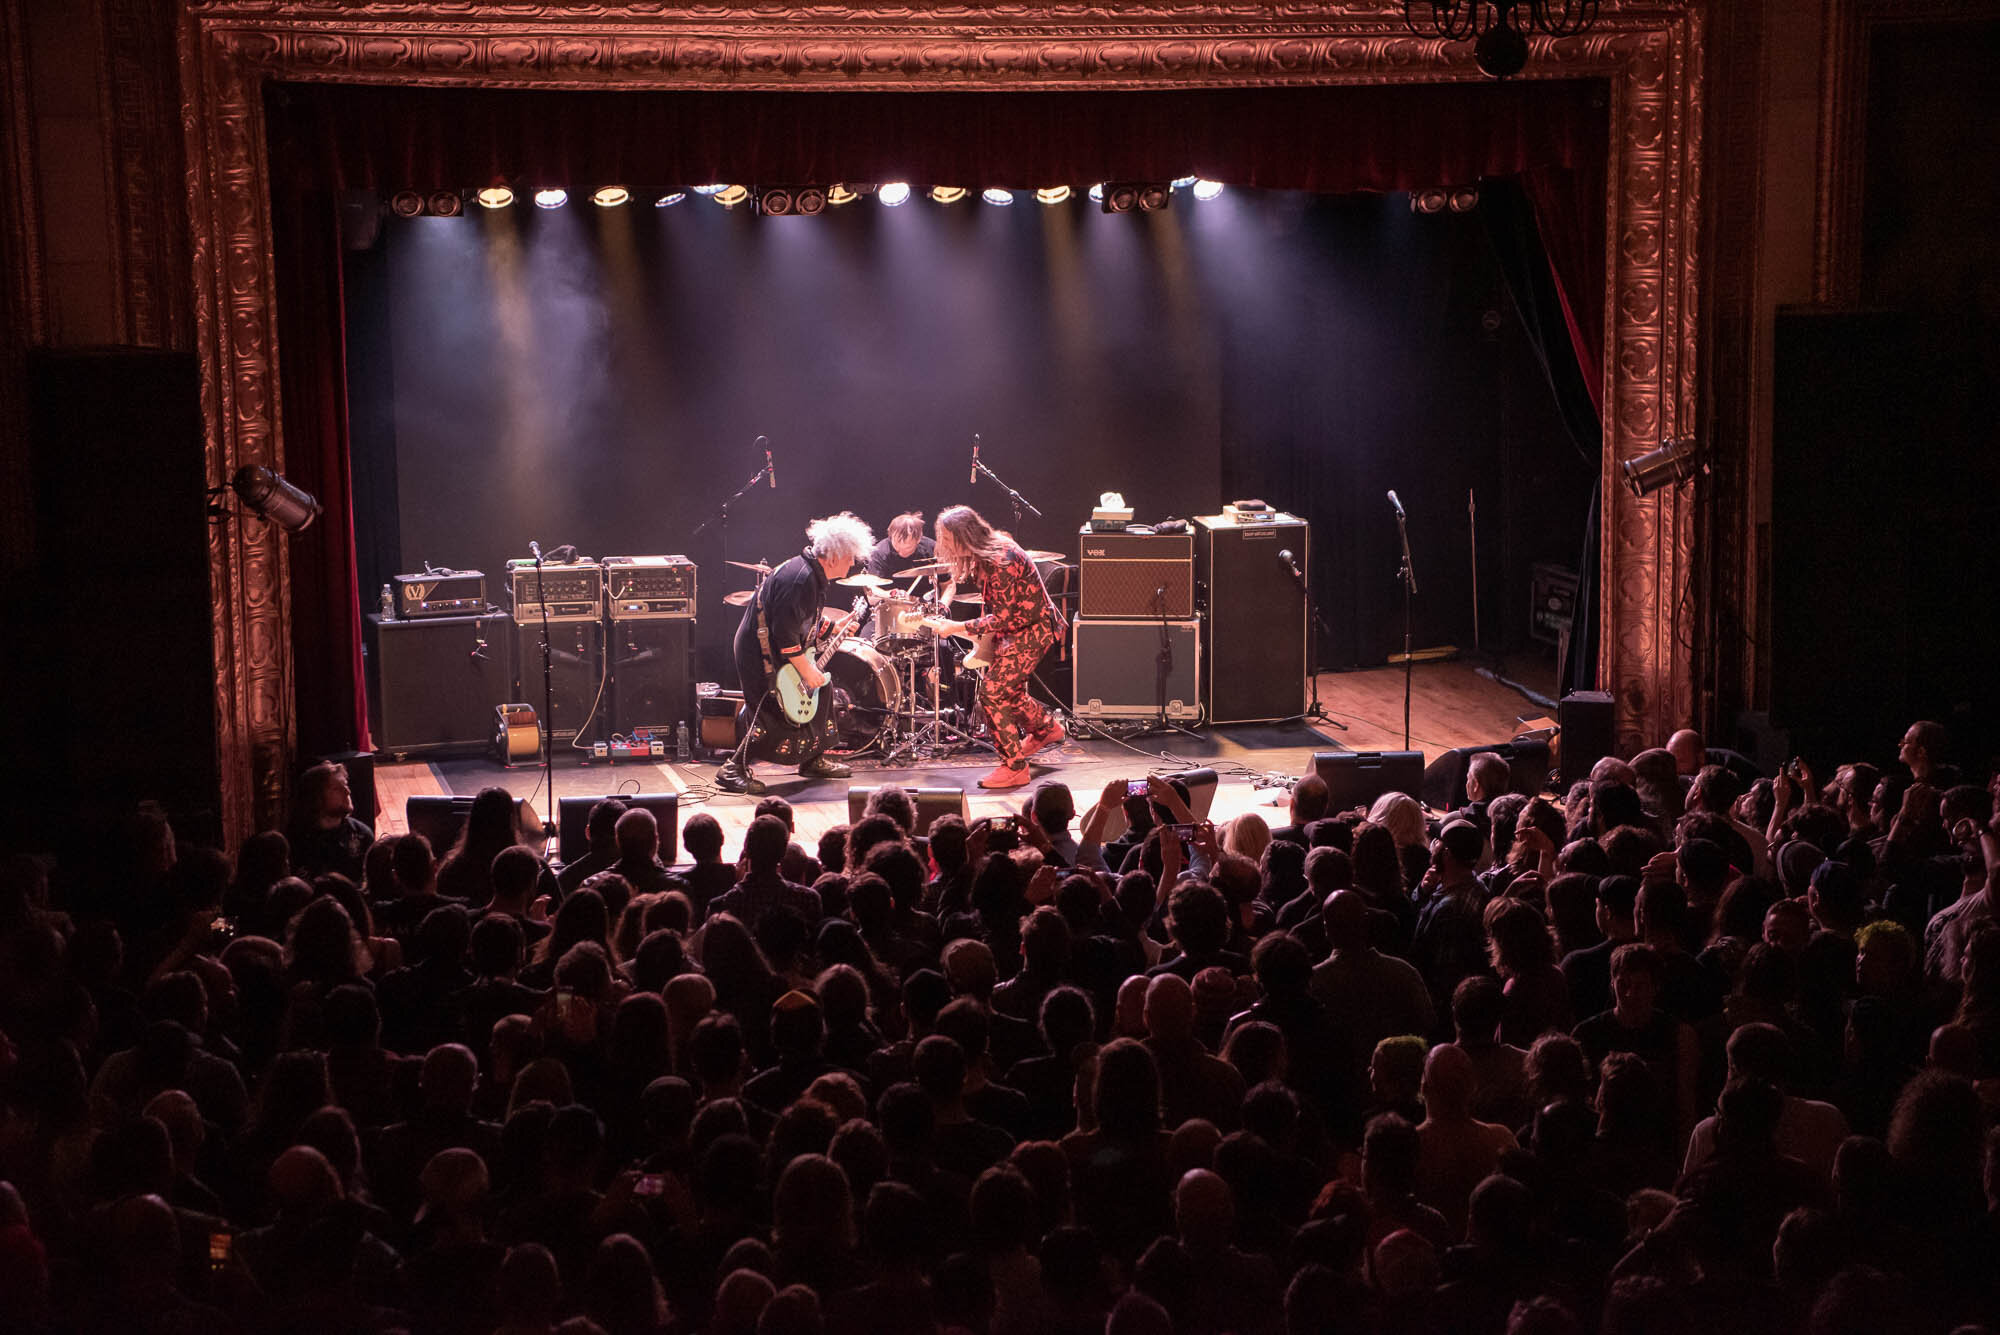 Melvins performing at Warsaw on Thursday, October 10, 2019.